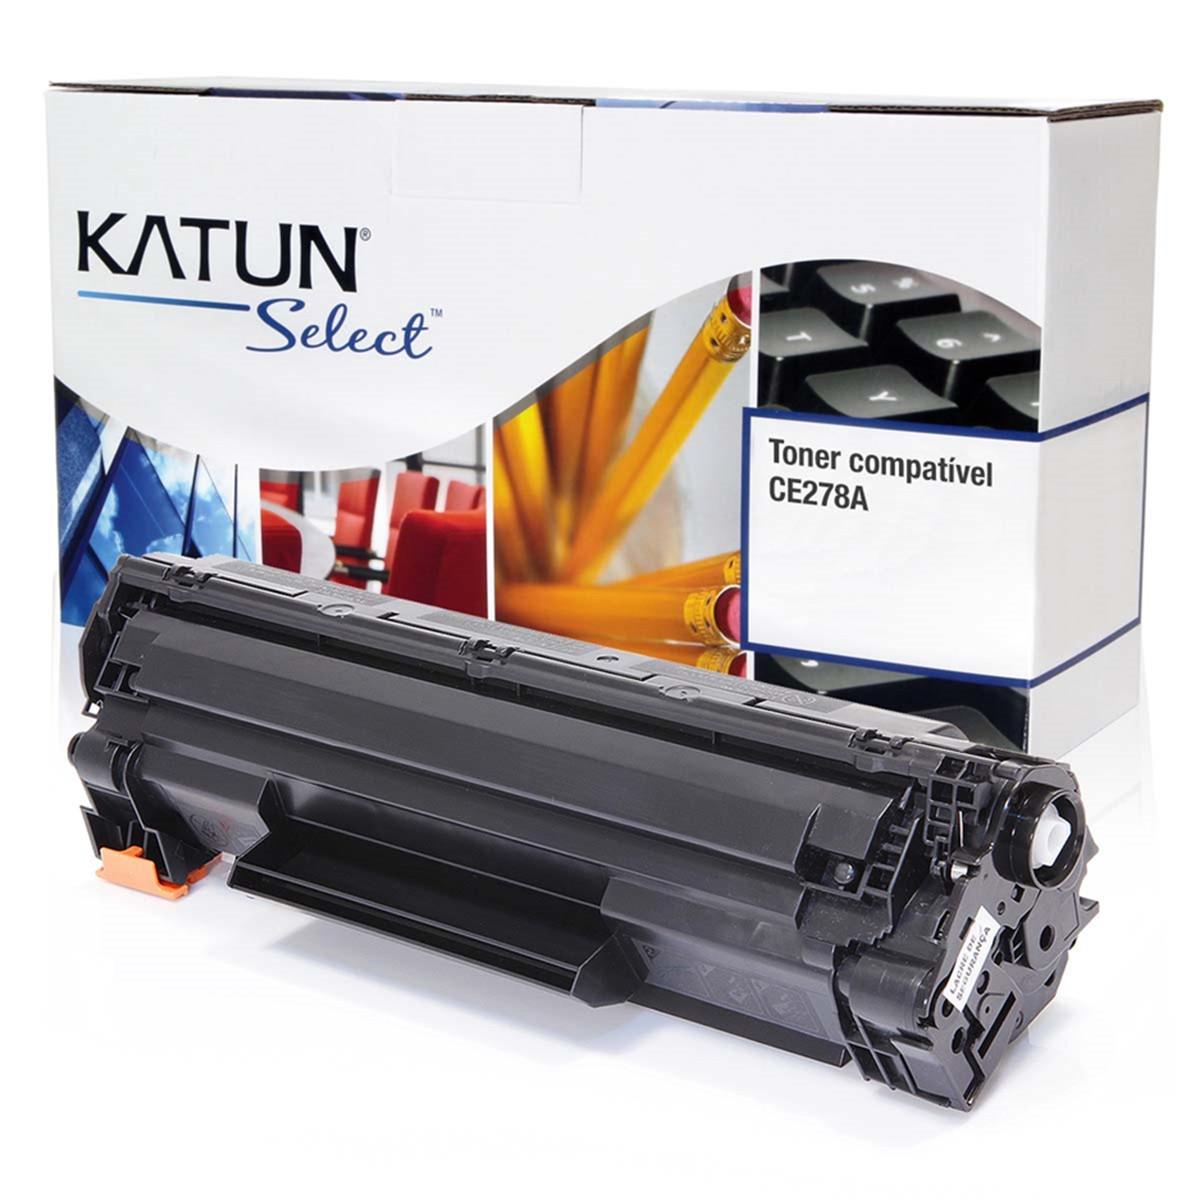 Toner Compatível com HP CE278A CE278AB | P1566 P1606 P1606DN M1536 M1536DNF | Katun Select 2.1k